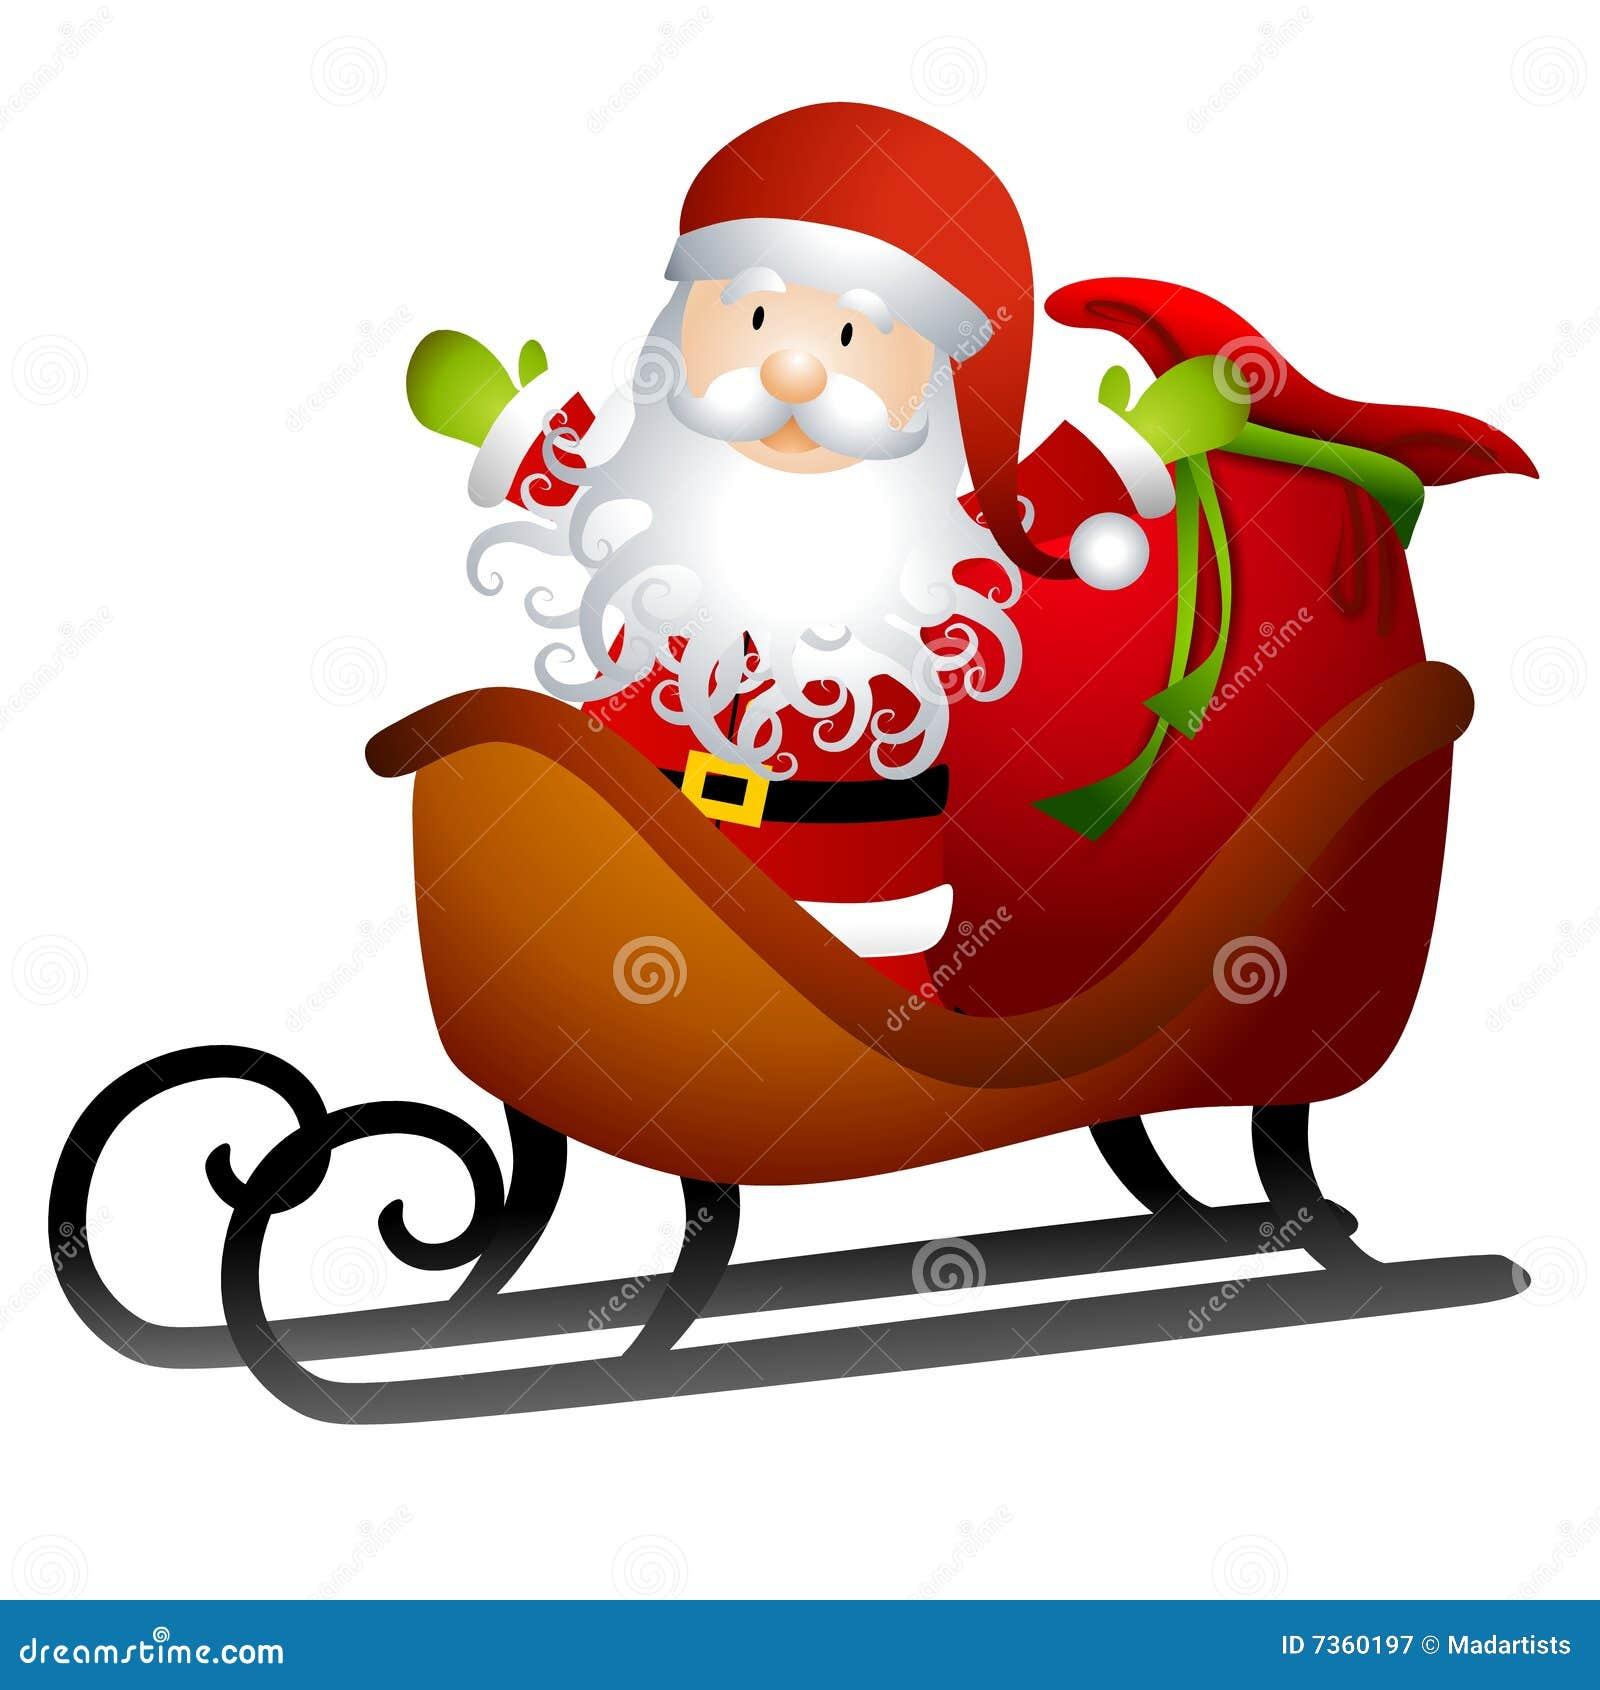 santa in sleigh of toys stock illustration illustration of clipart rh dreamstime com santa in his sleigh clipart santa sleigh clipart black and white